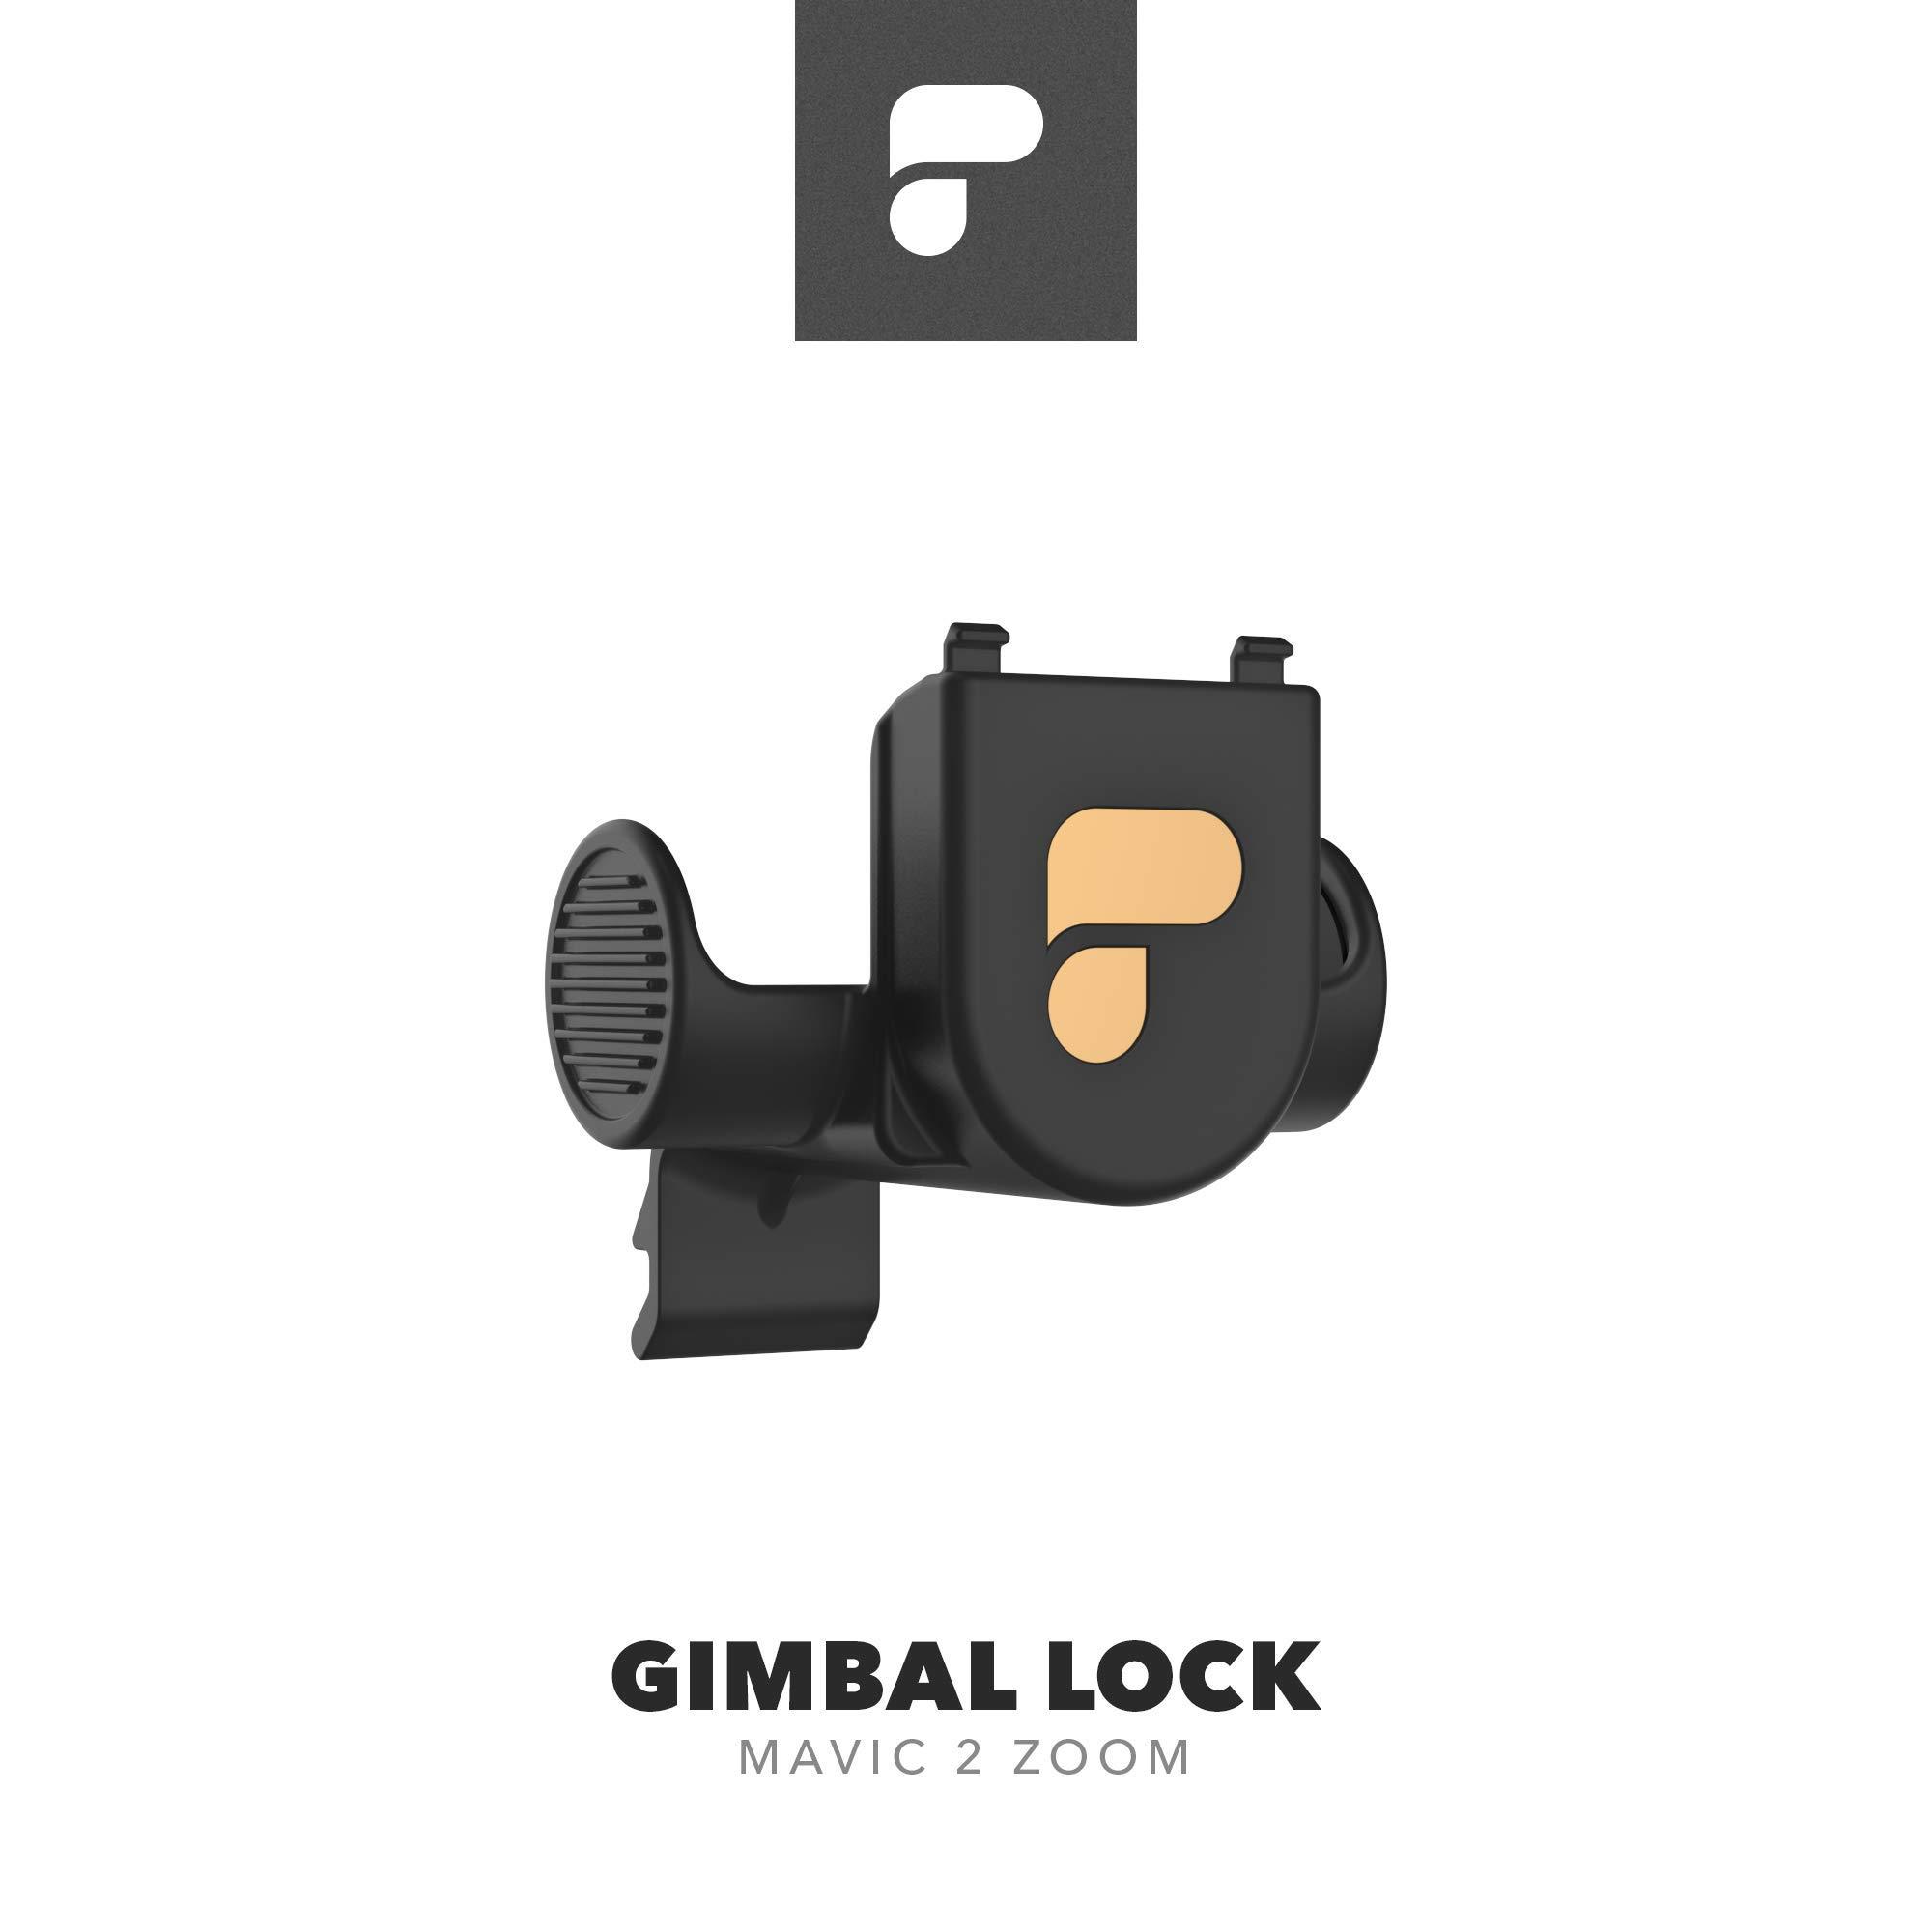 PolarPro Gimbal Lock/Lens Cover for DJI Mavic 2 Zoom by PolarPro